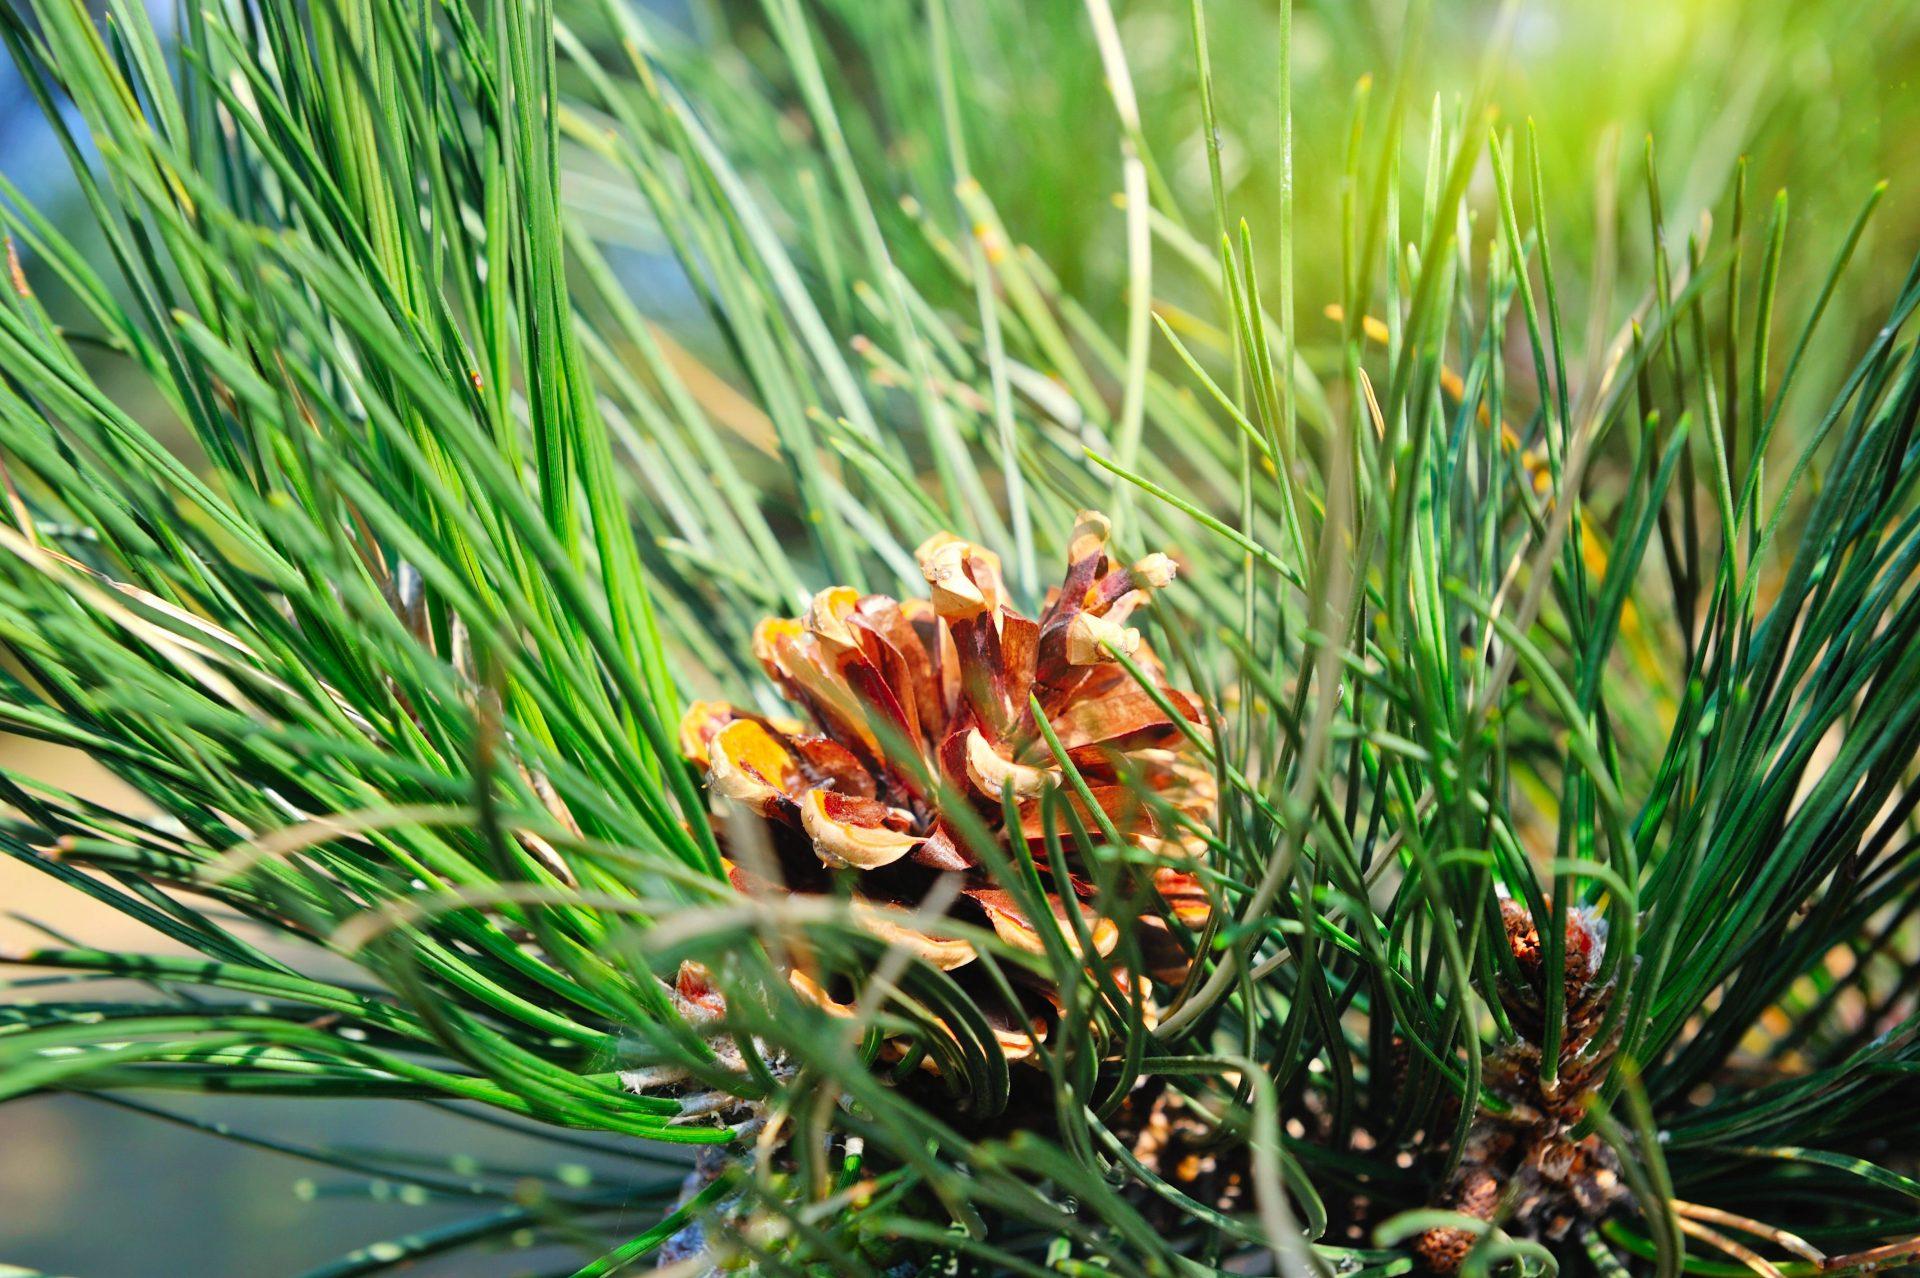 tree service in Monkton MD -- Keil Tree Experts